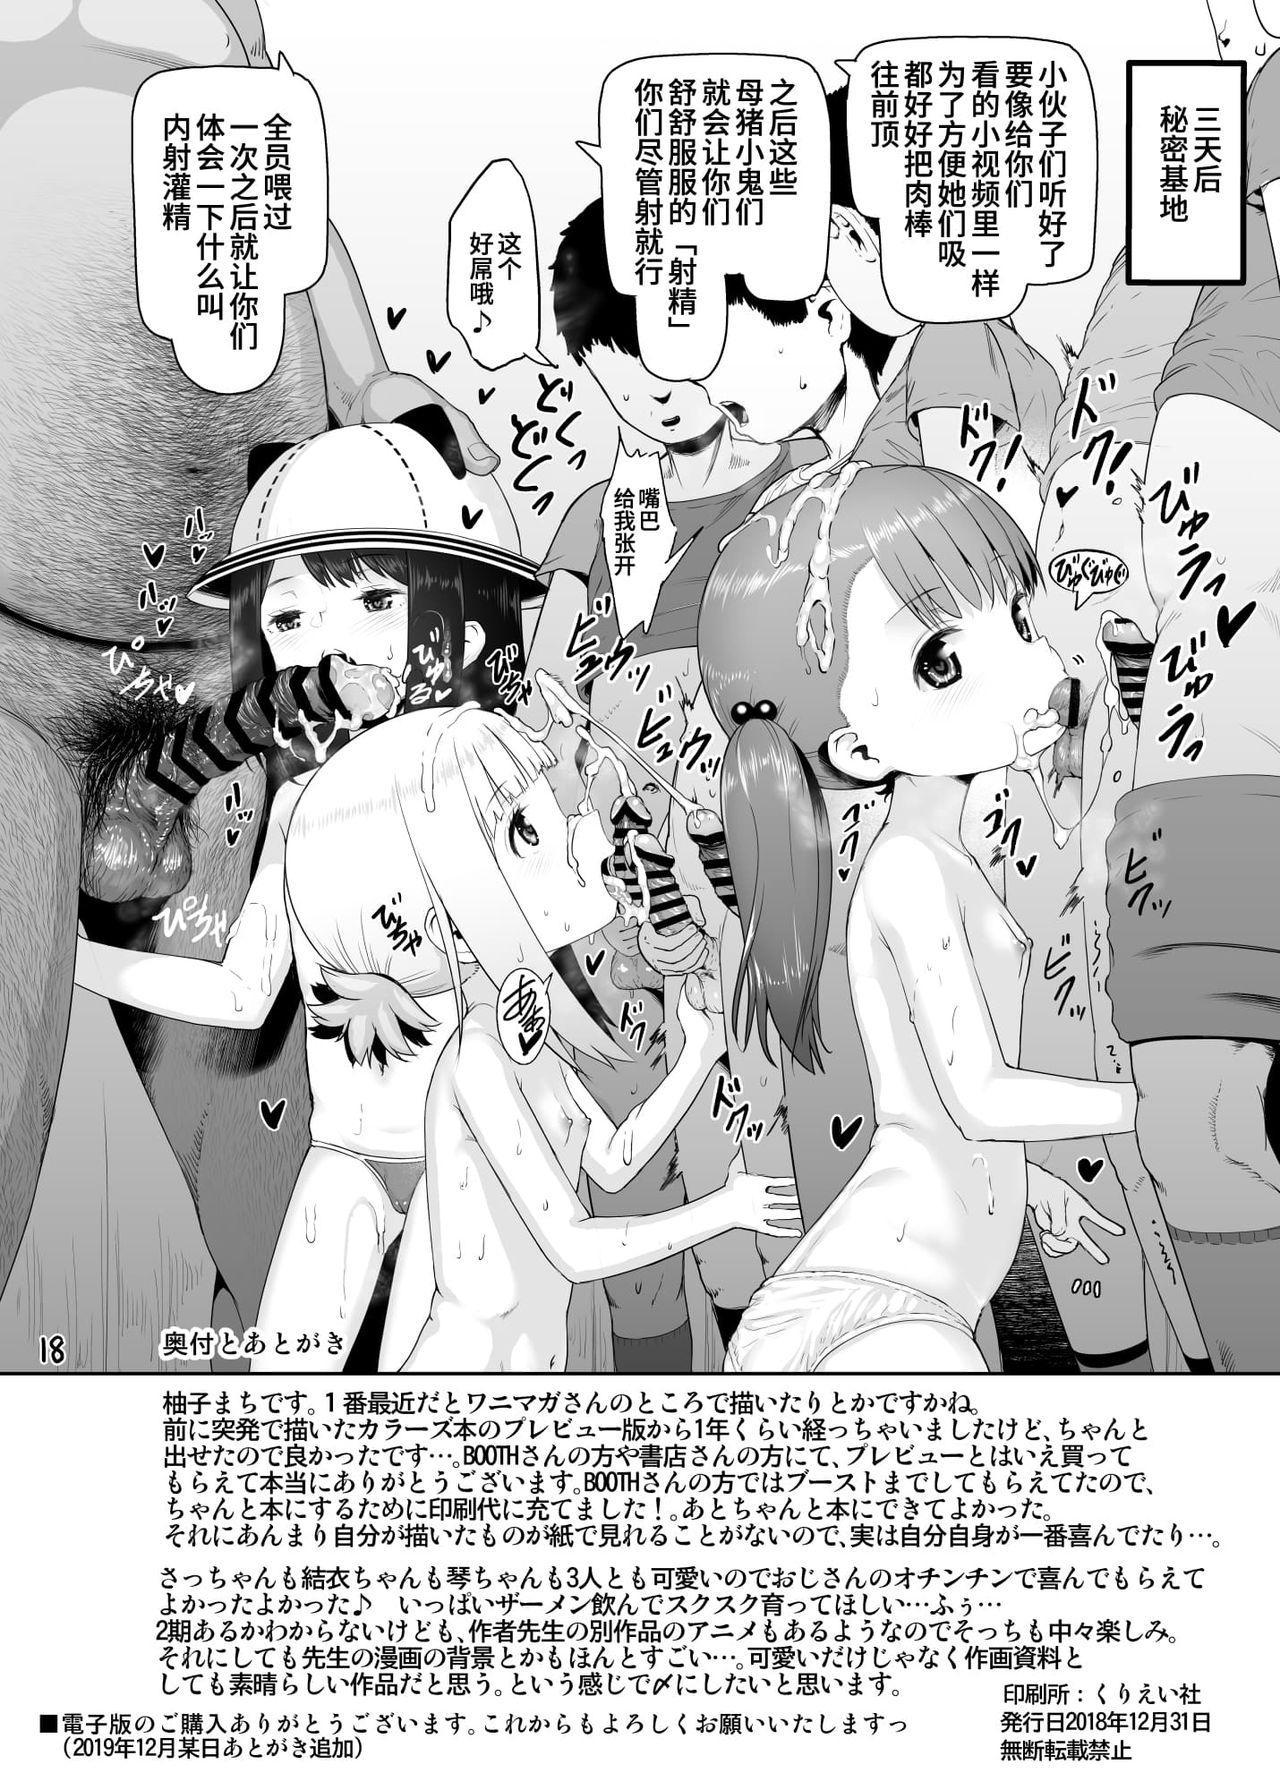 [E-lse (Yuzu Machi)] Sacchan Yui-chan Kotoha-chan to Okashi de Nakayoku Naru Hon (Mitsuboshi Colors) [Chinese] [Digital] 16